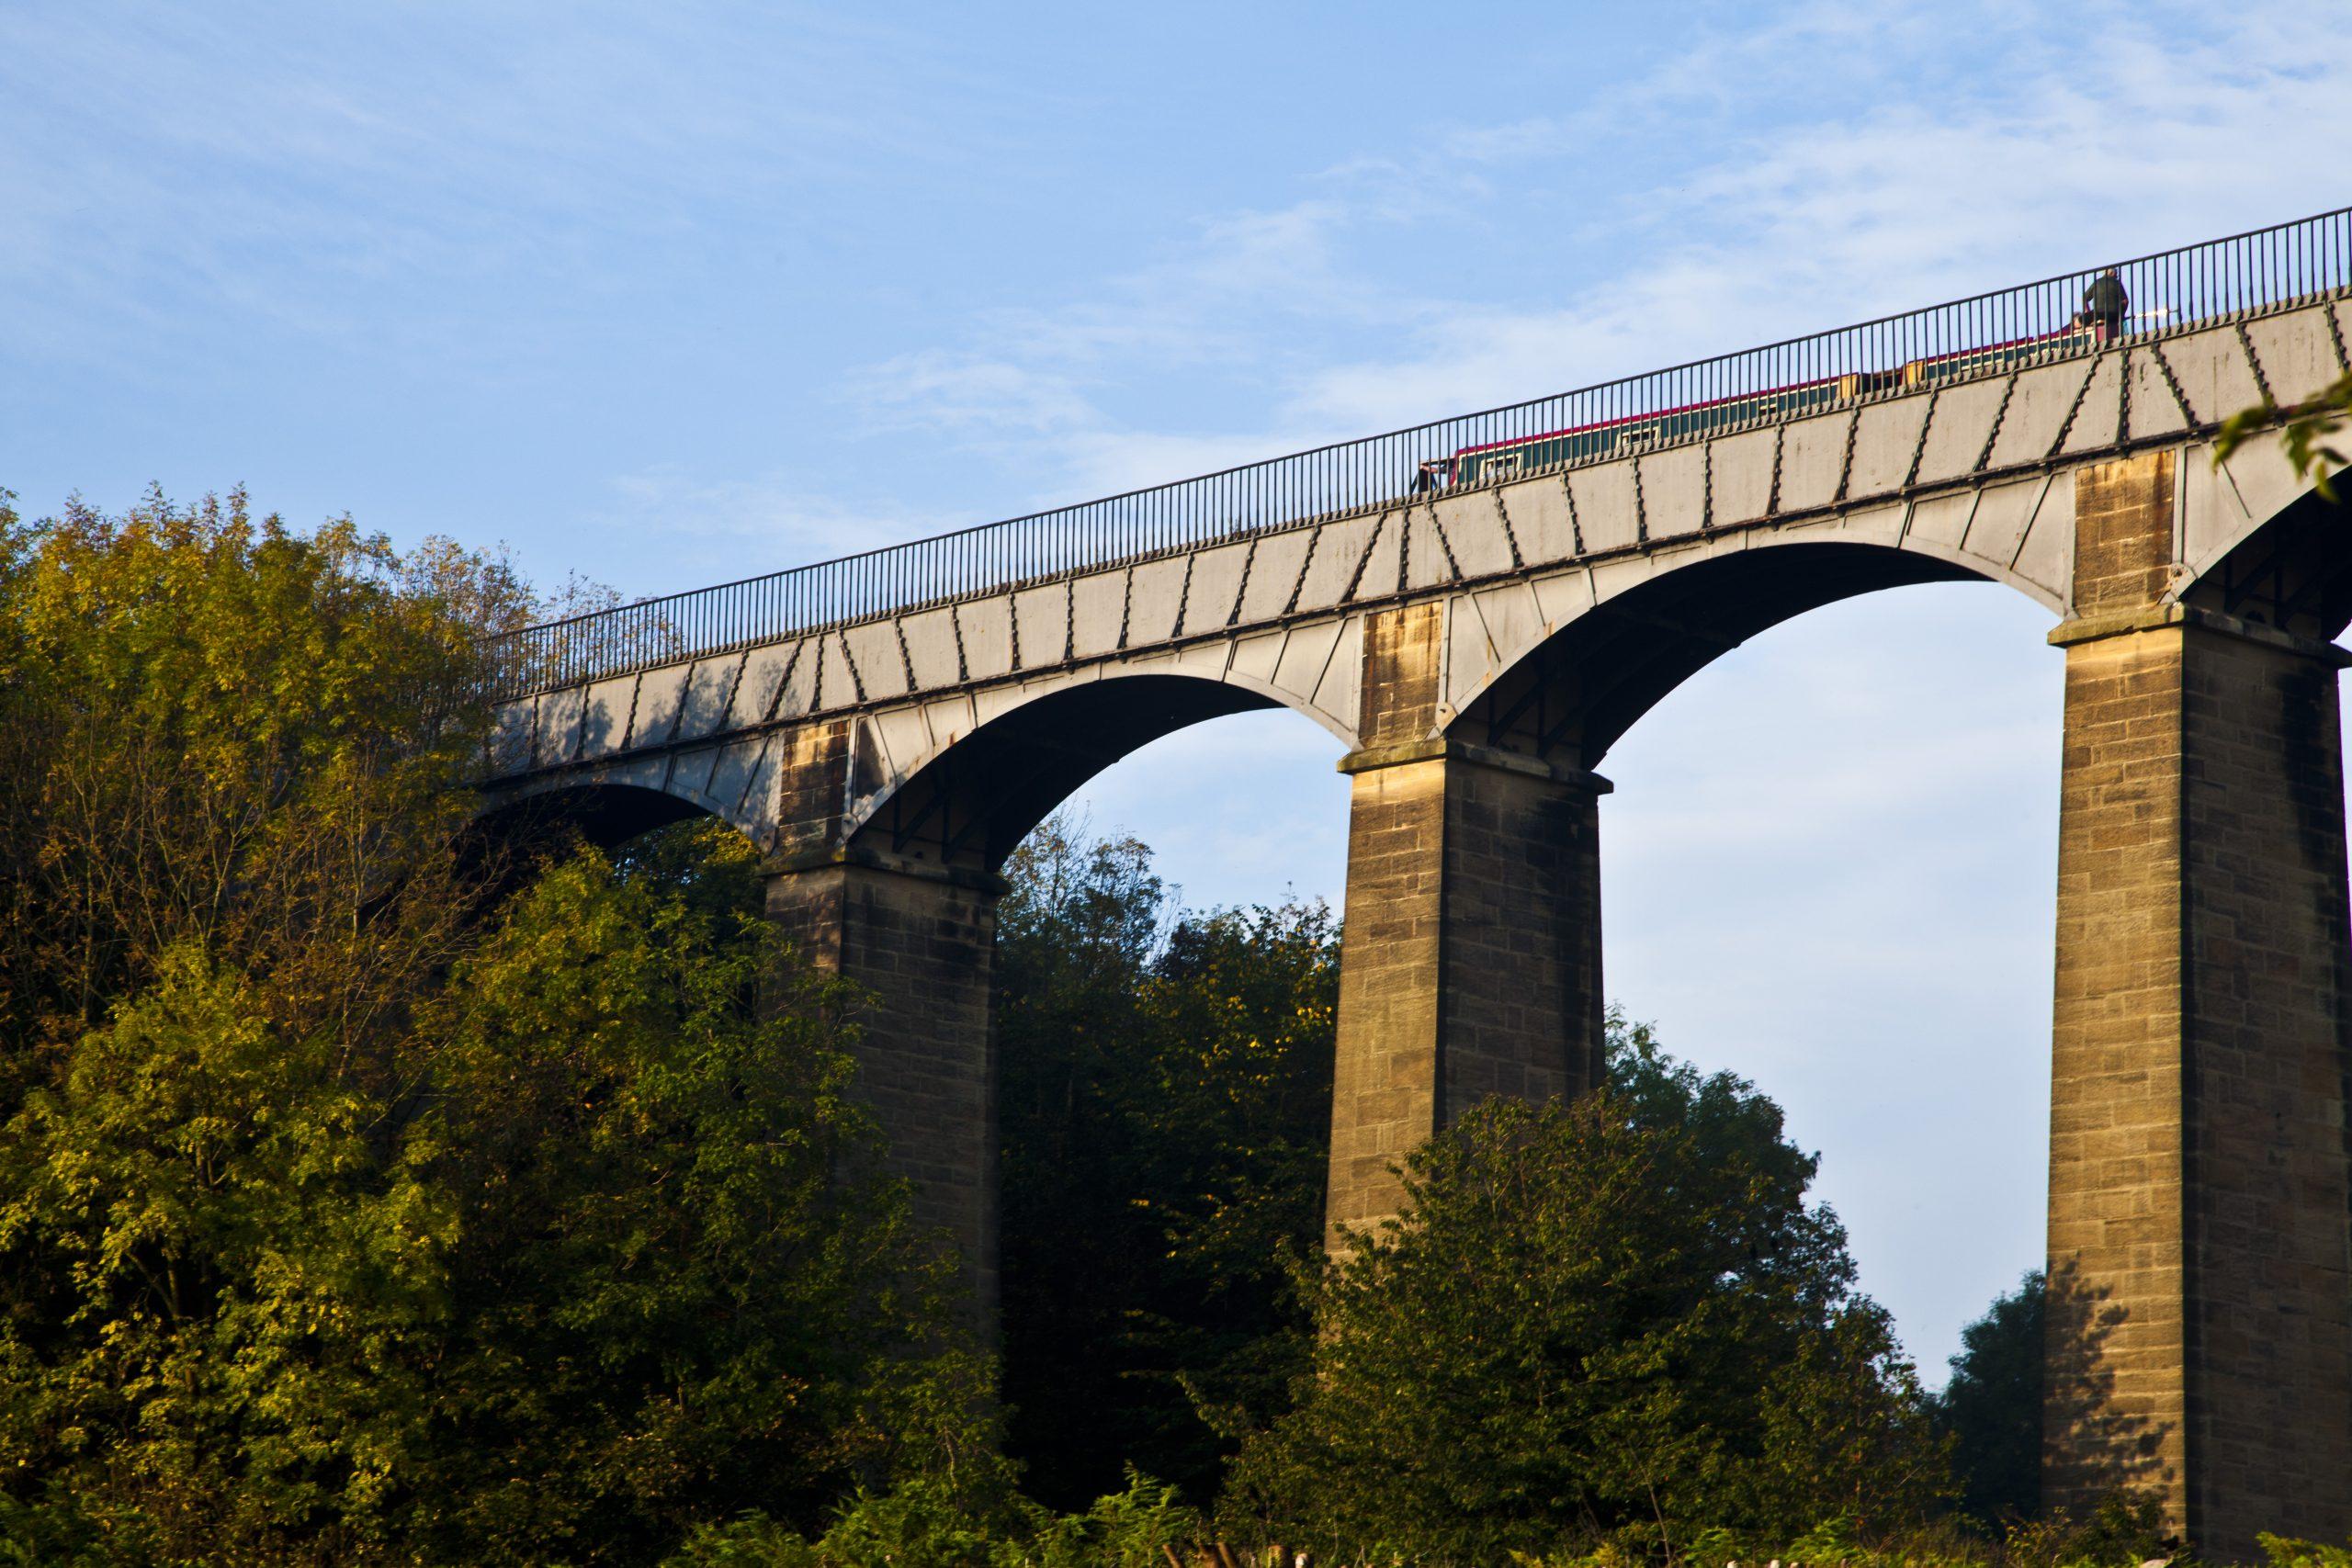 Poncysyllte Aqueduct